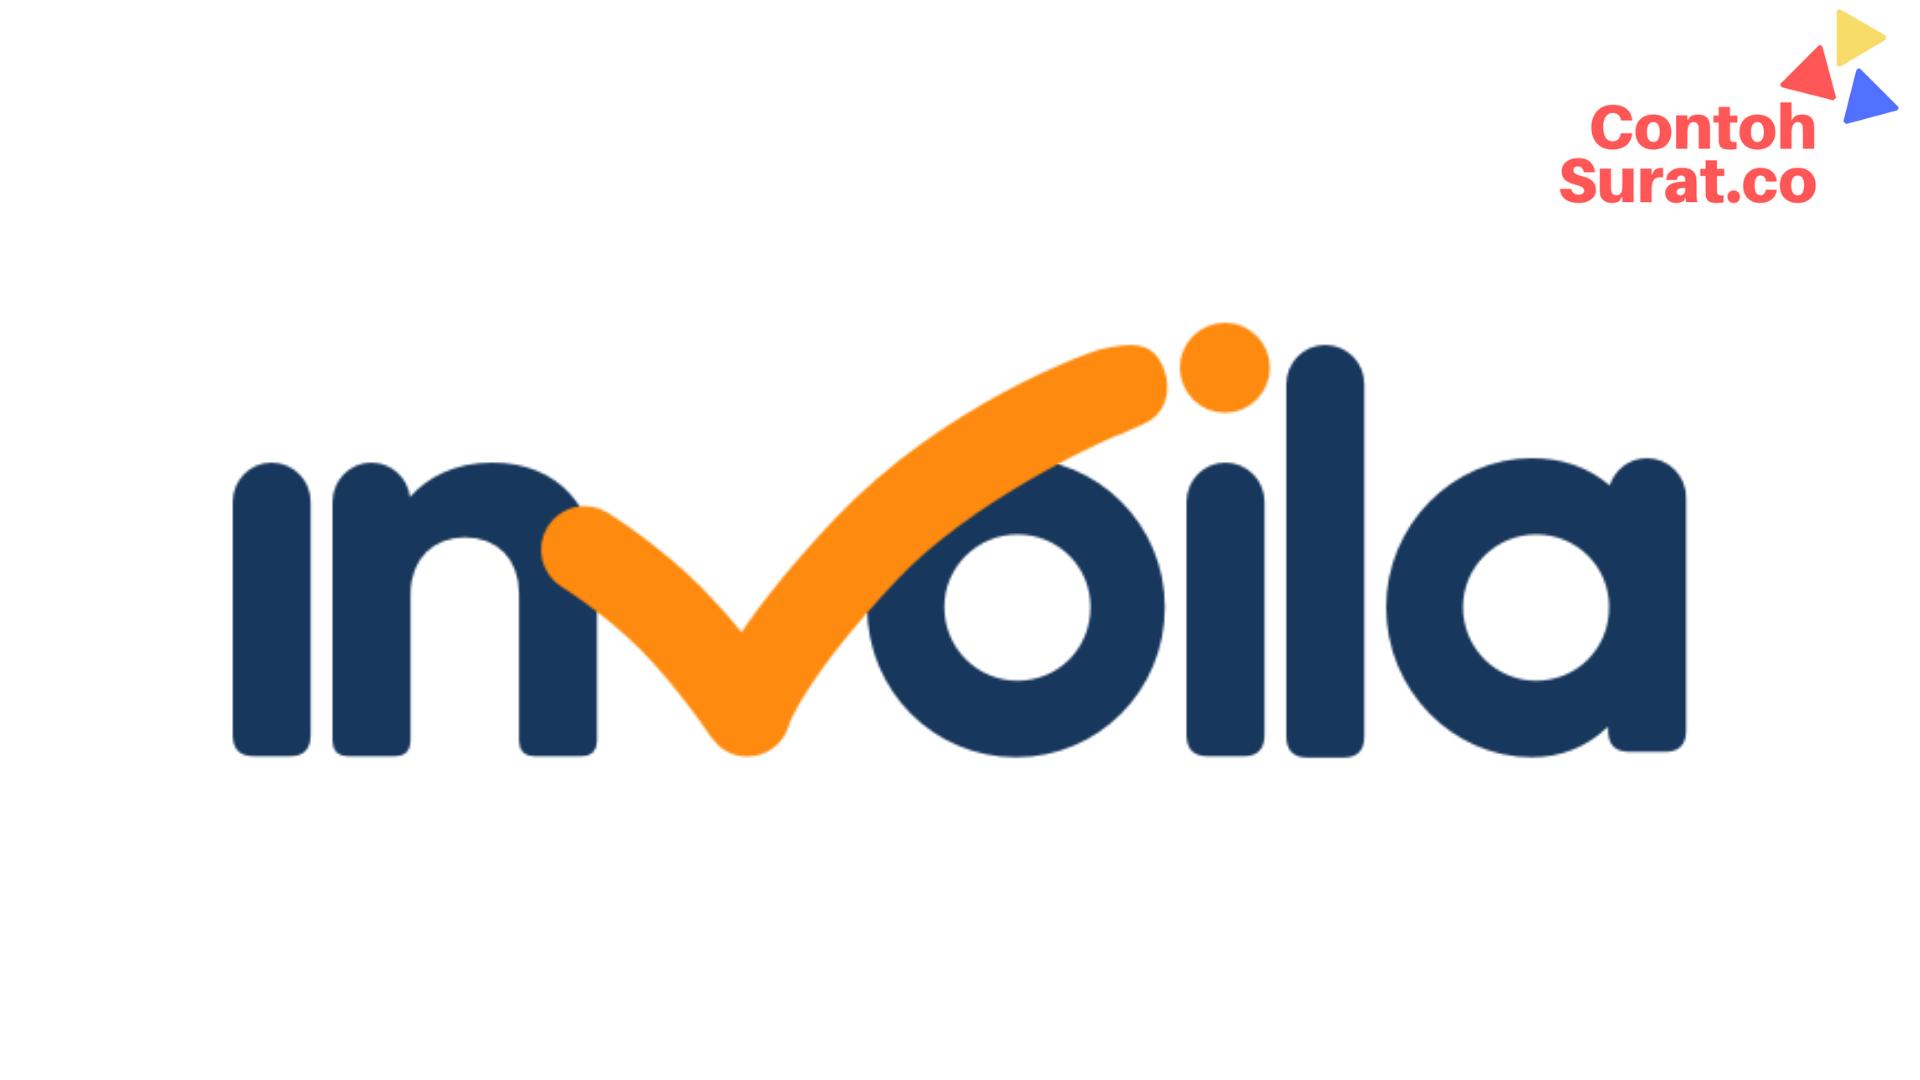 Invoila